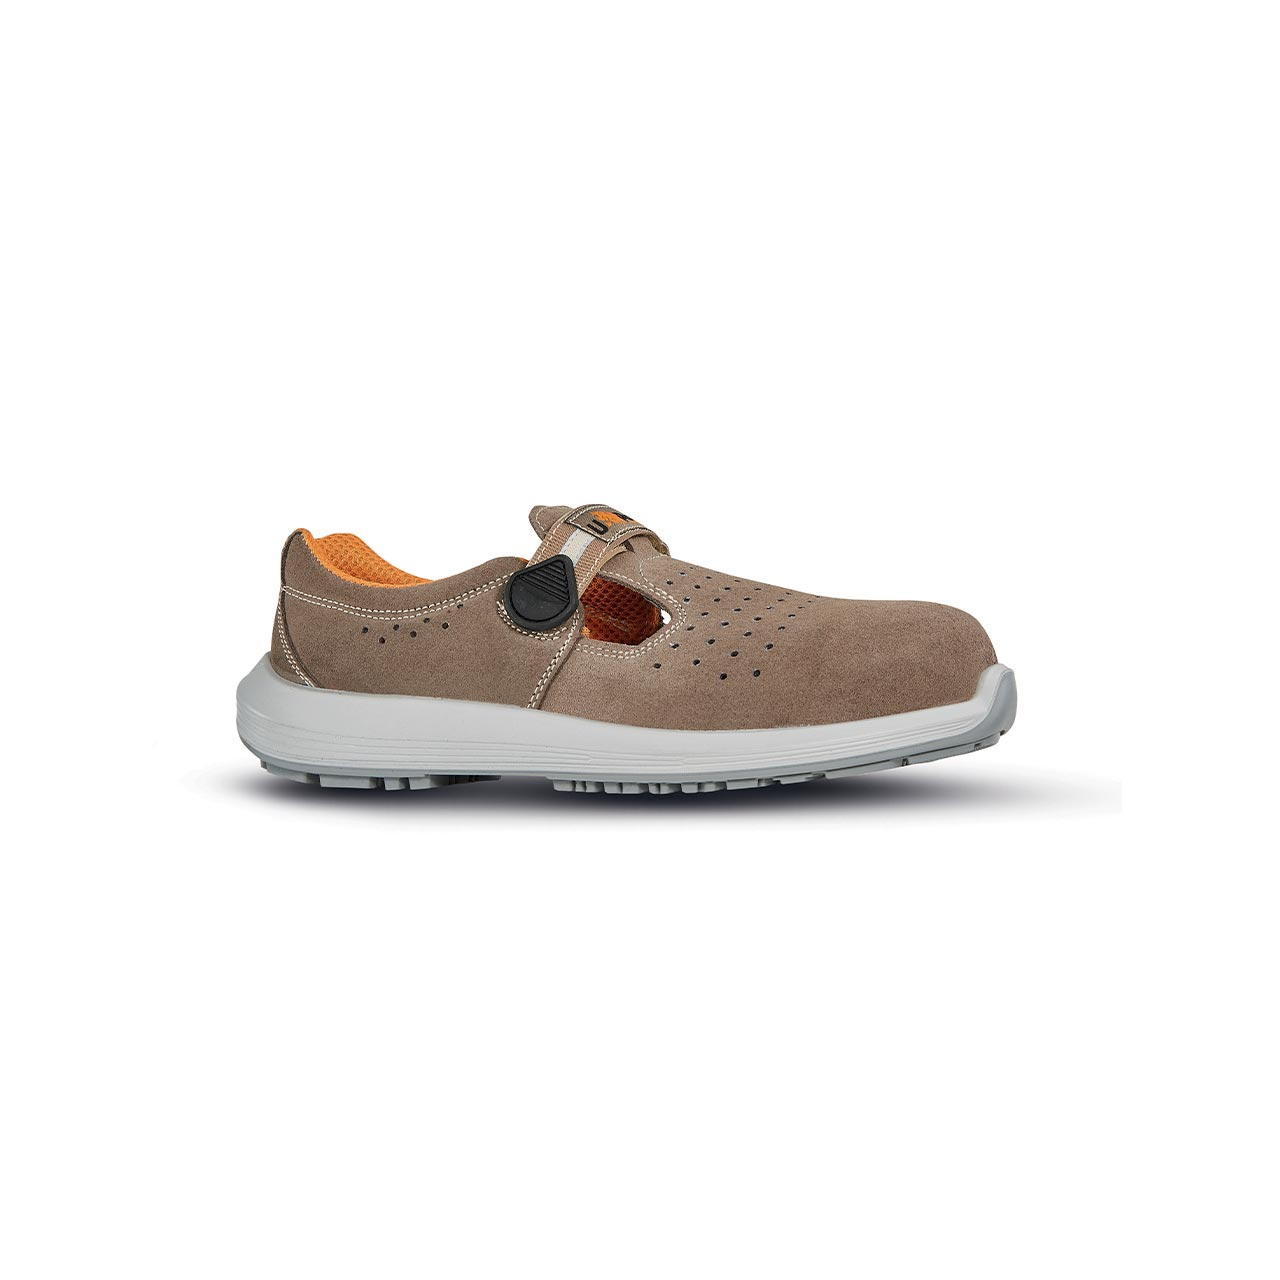 scarpa antinfortunistica upower modello soyuzsong linea stepone vista laterale